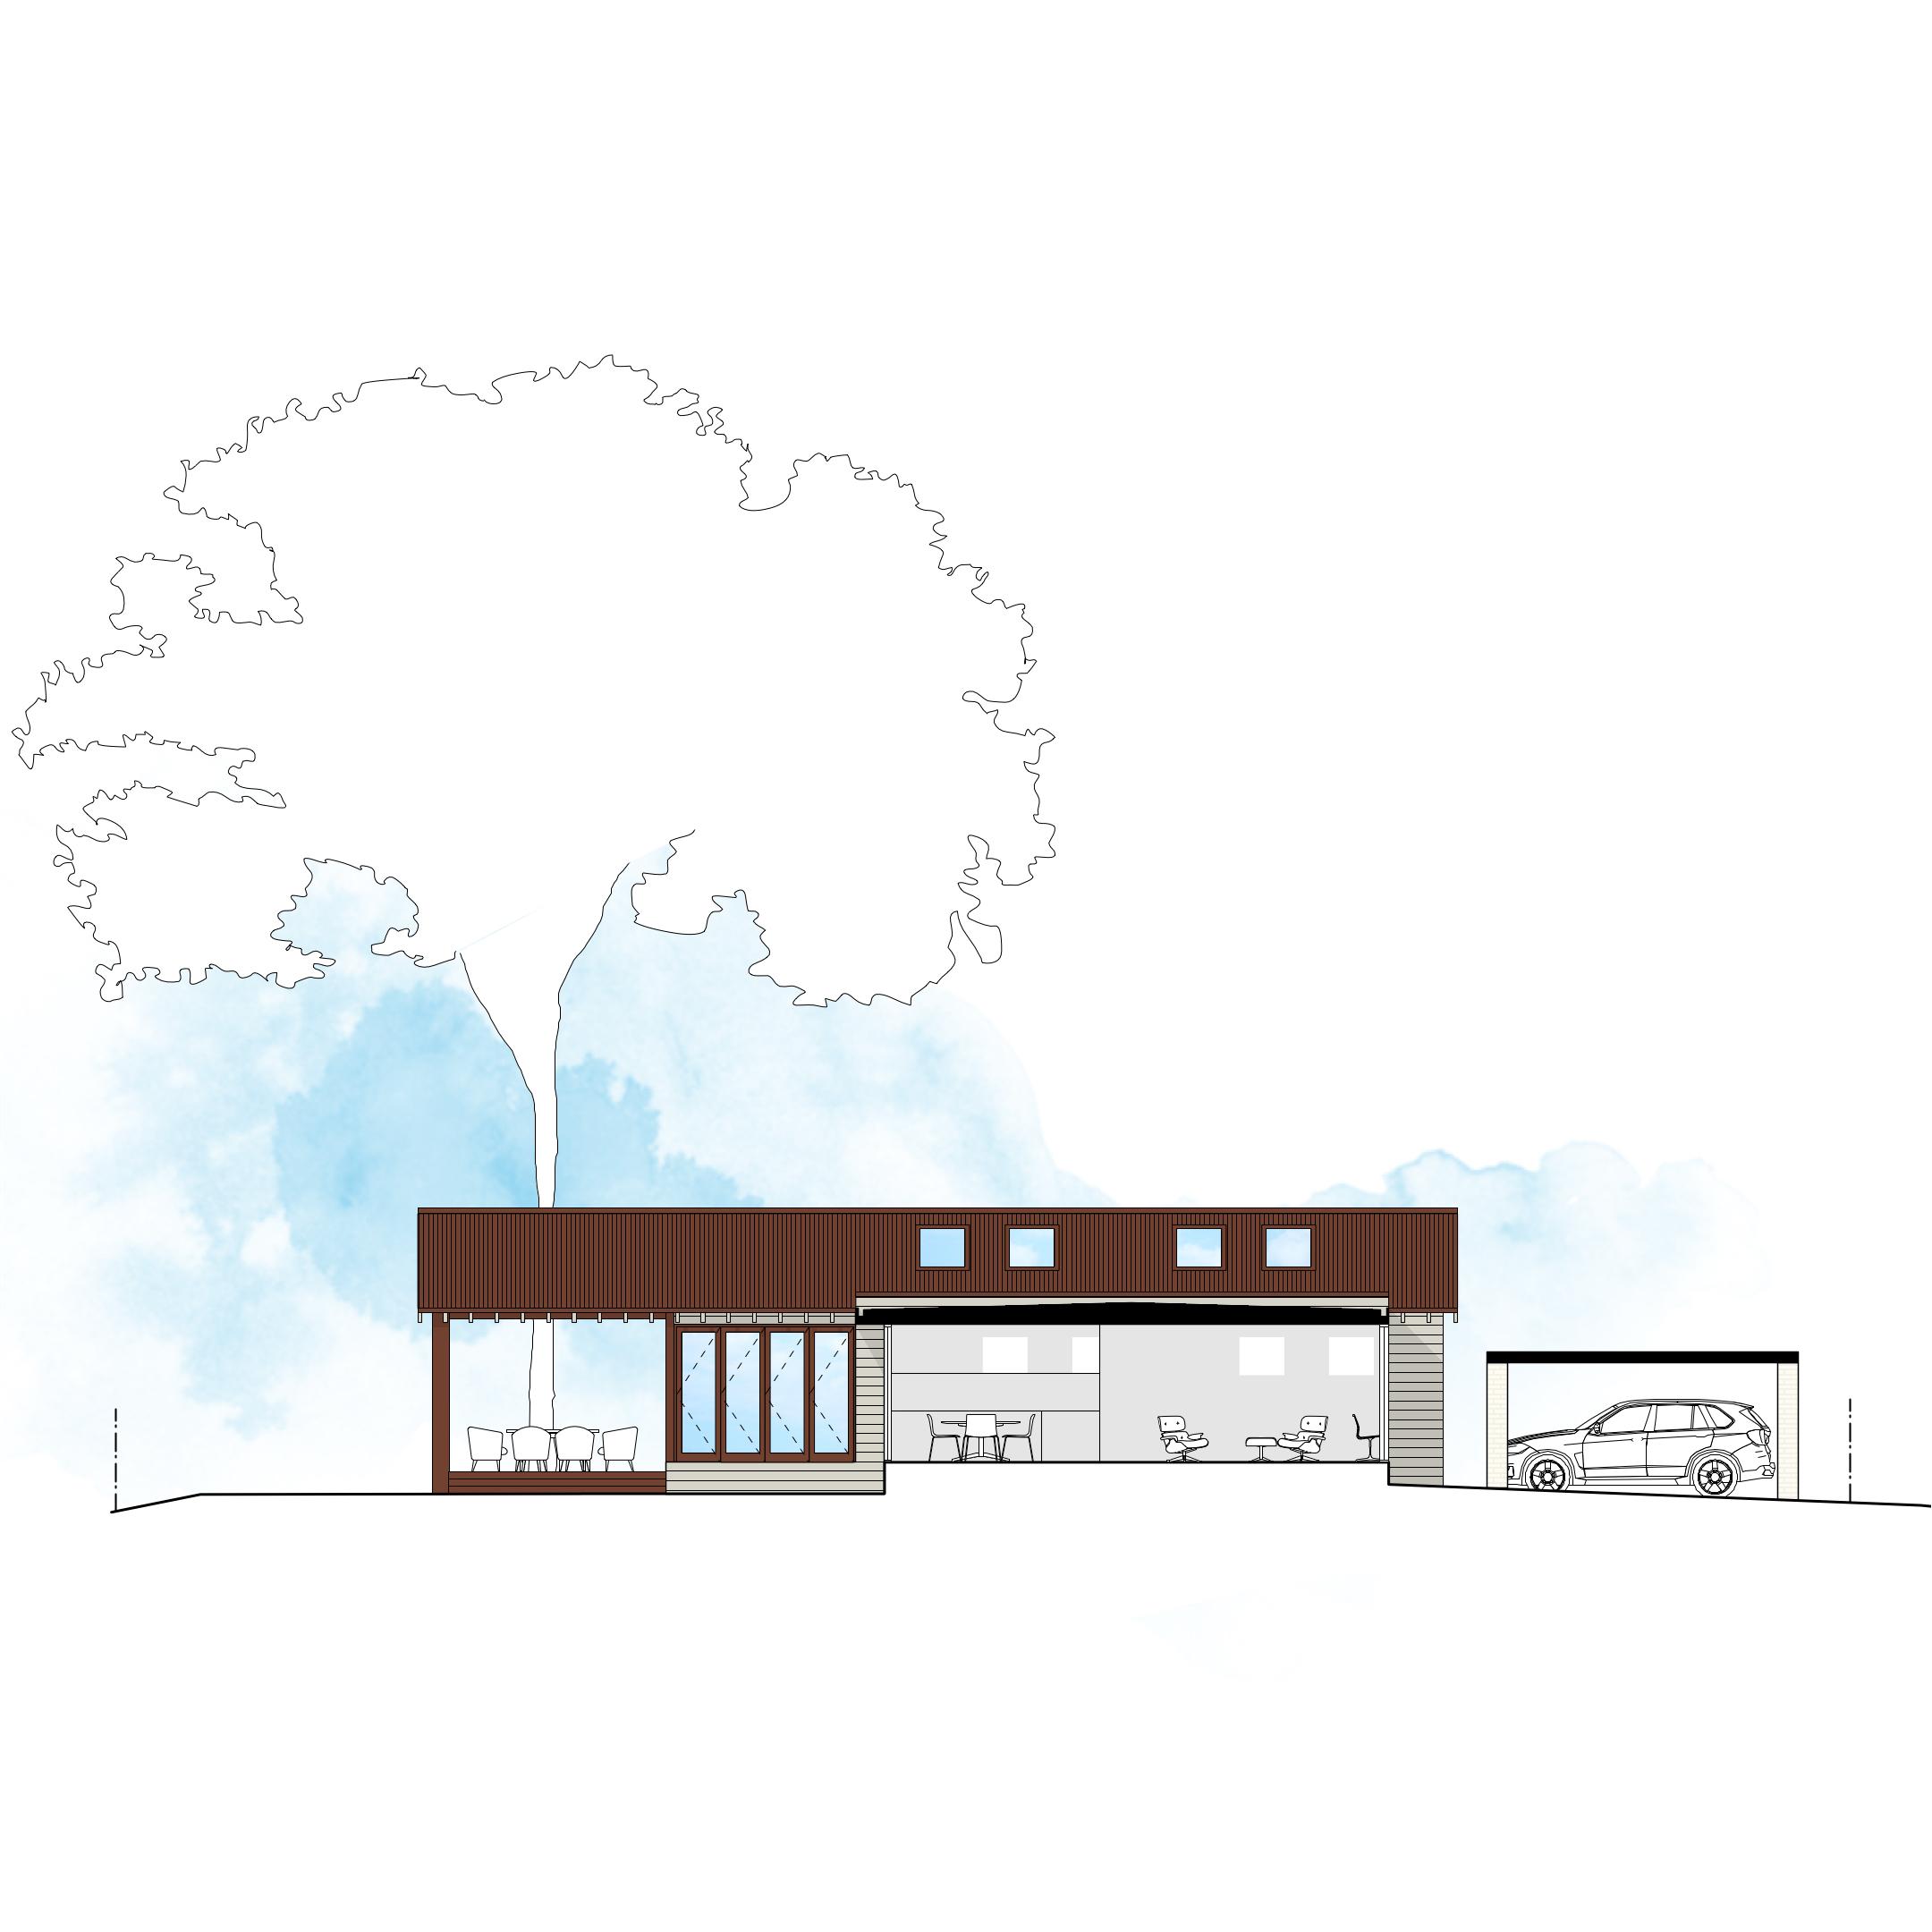 James Allen Architect Beecroft Beecroft House 5.jpg